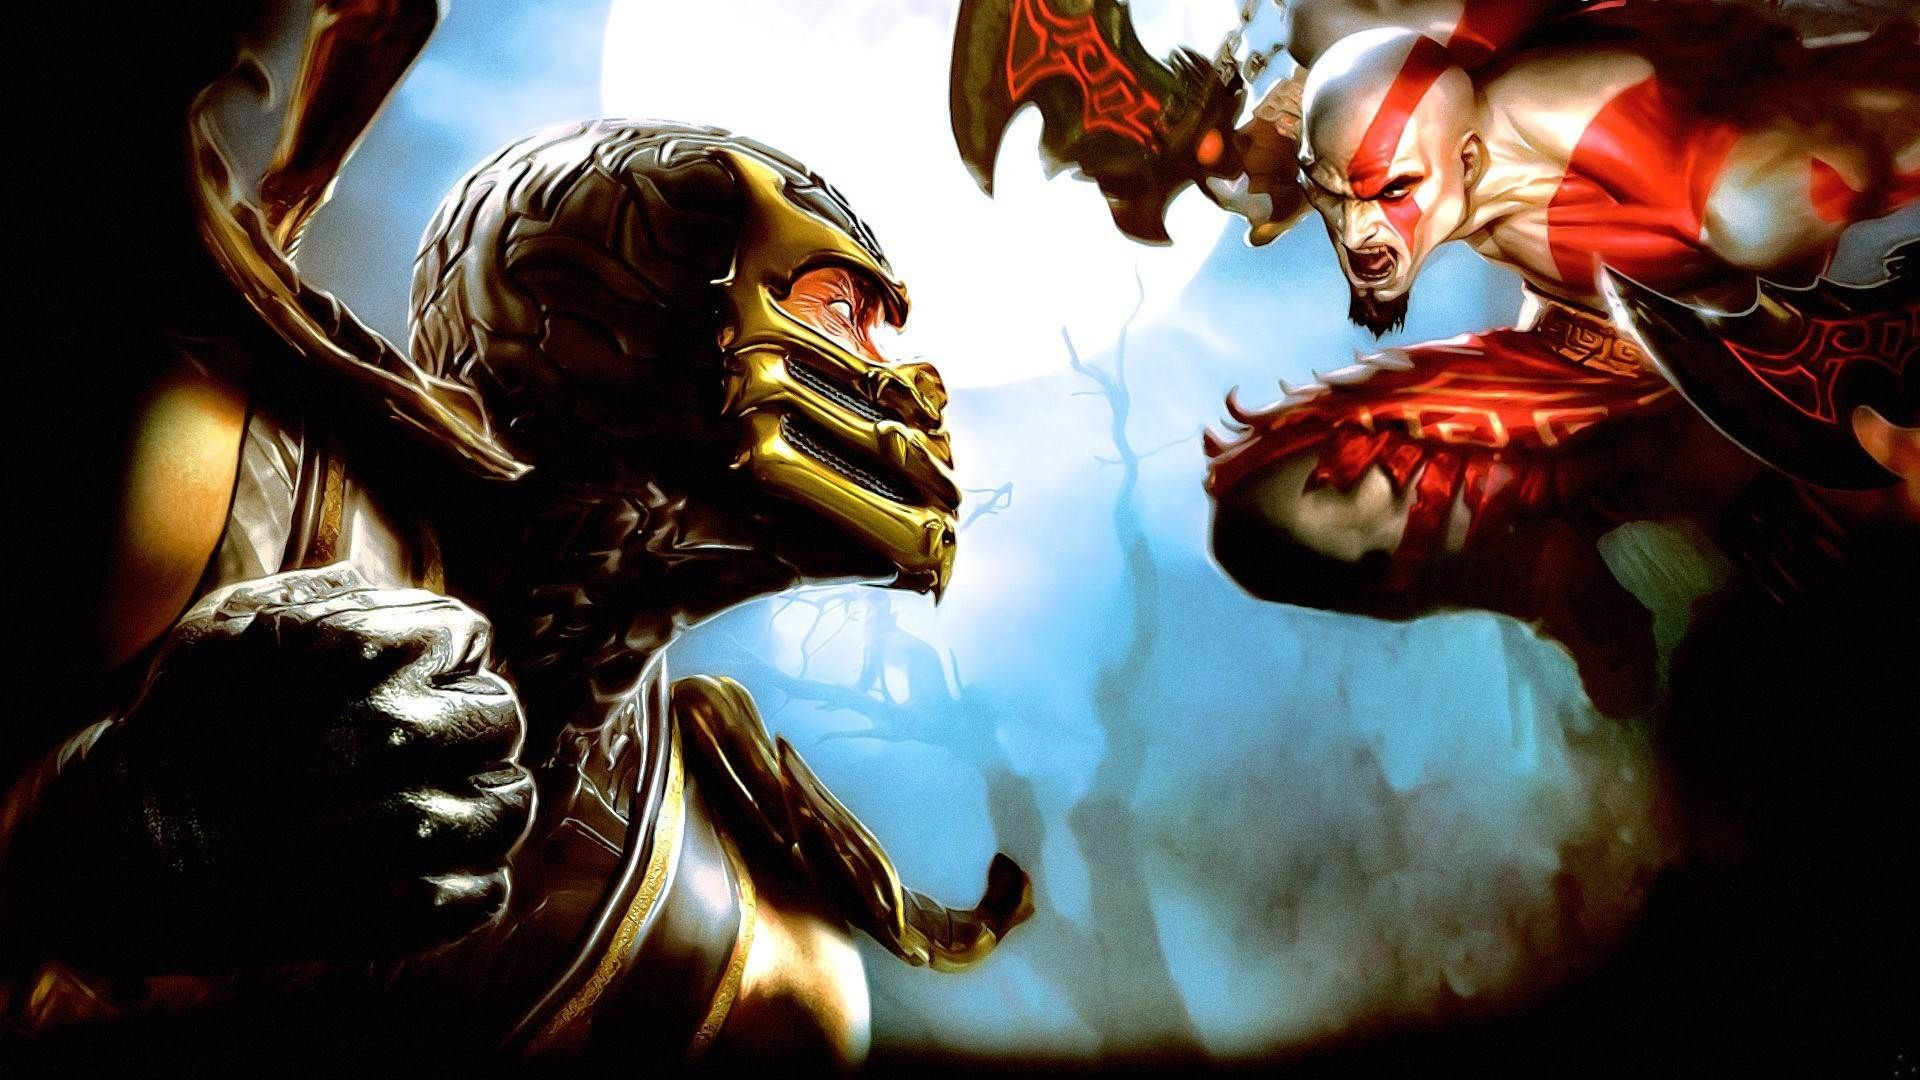 mortal kombat, scorpion , kratos, god of war wallpapers 1920×1200